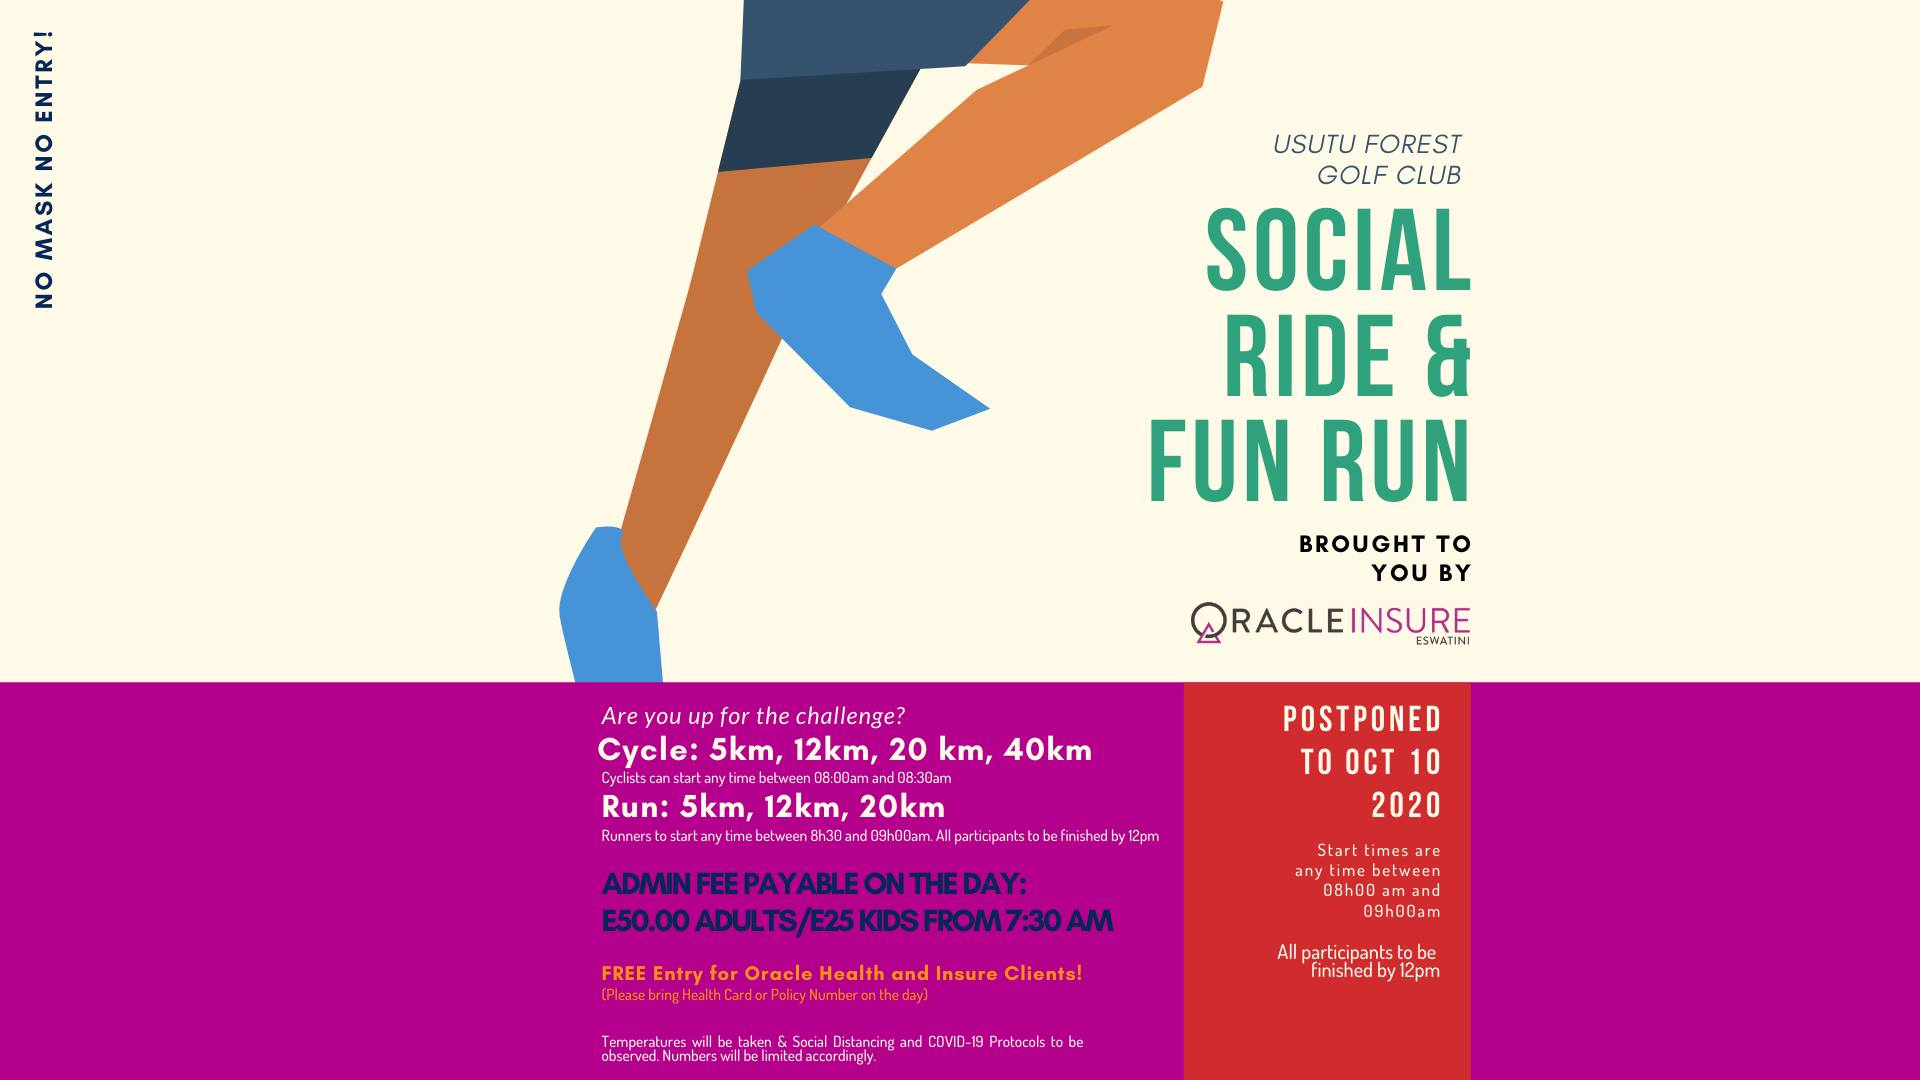 Usutu Forest Golf Club Social Ride & Fun Run